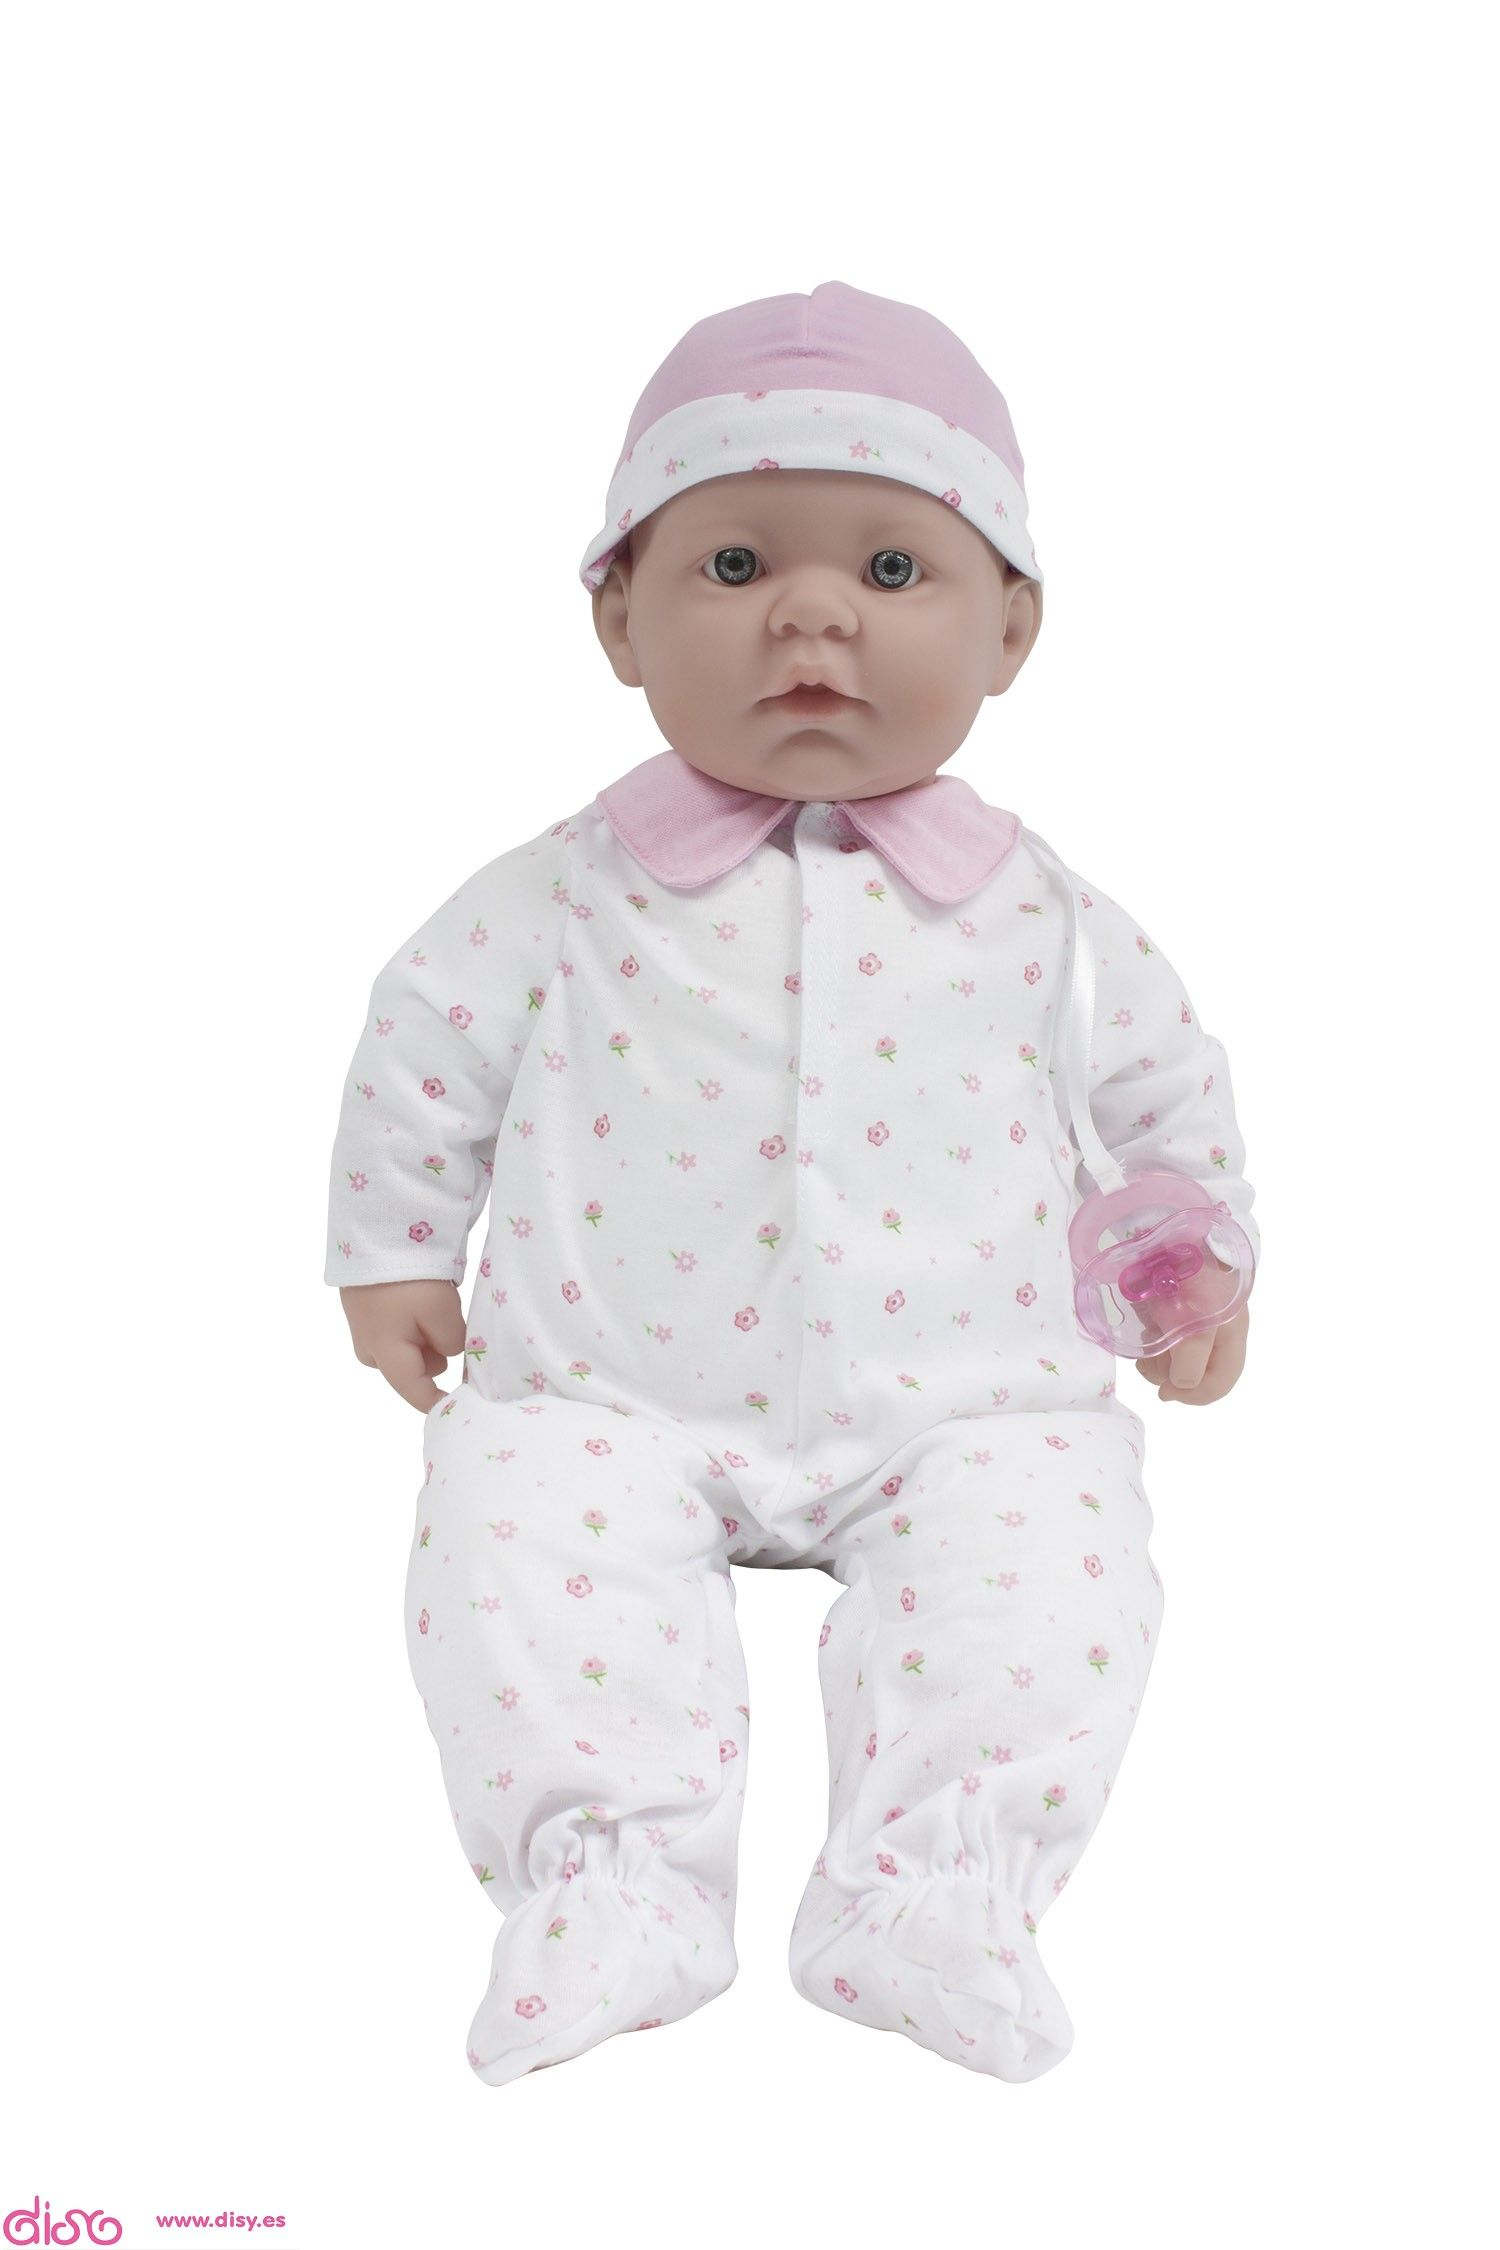 muñecasberenguer #berenguerdolls #muñecasbebesdisy Muñecas bebes ...